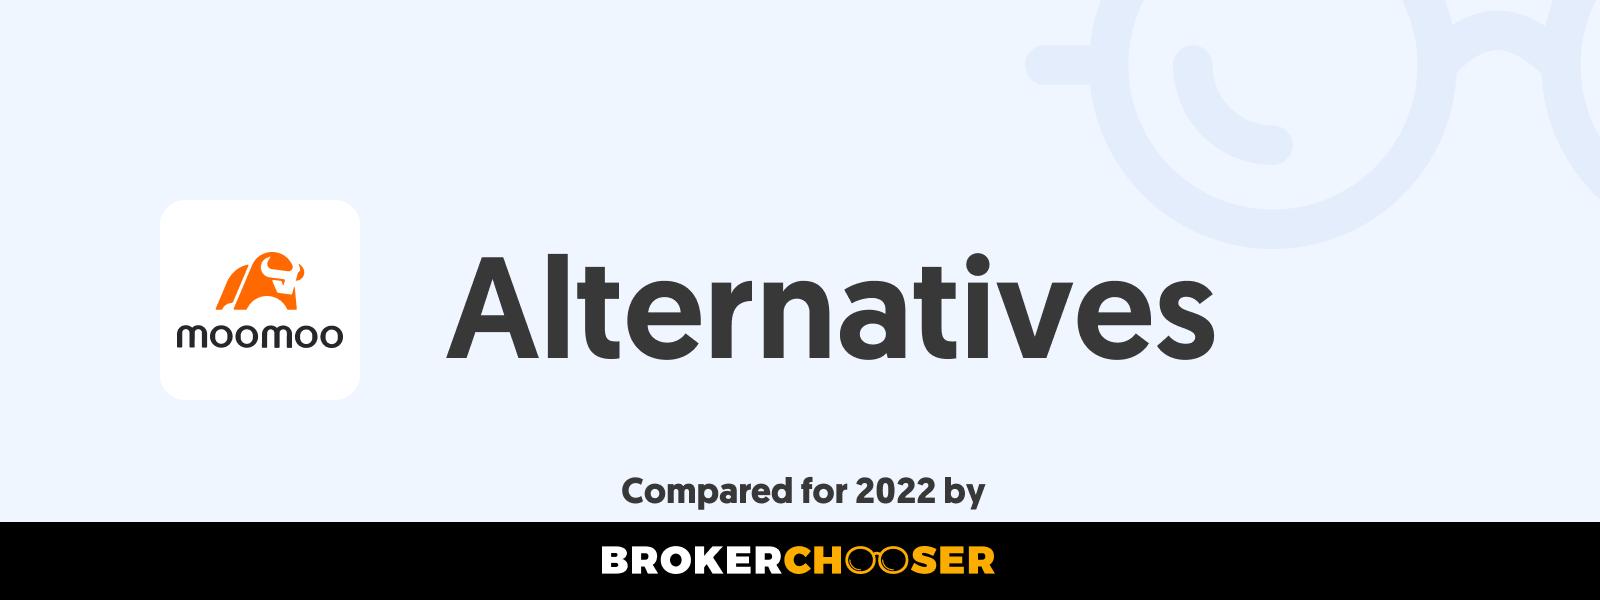 MooMoo Alternatives